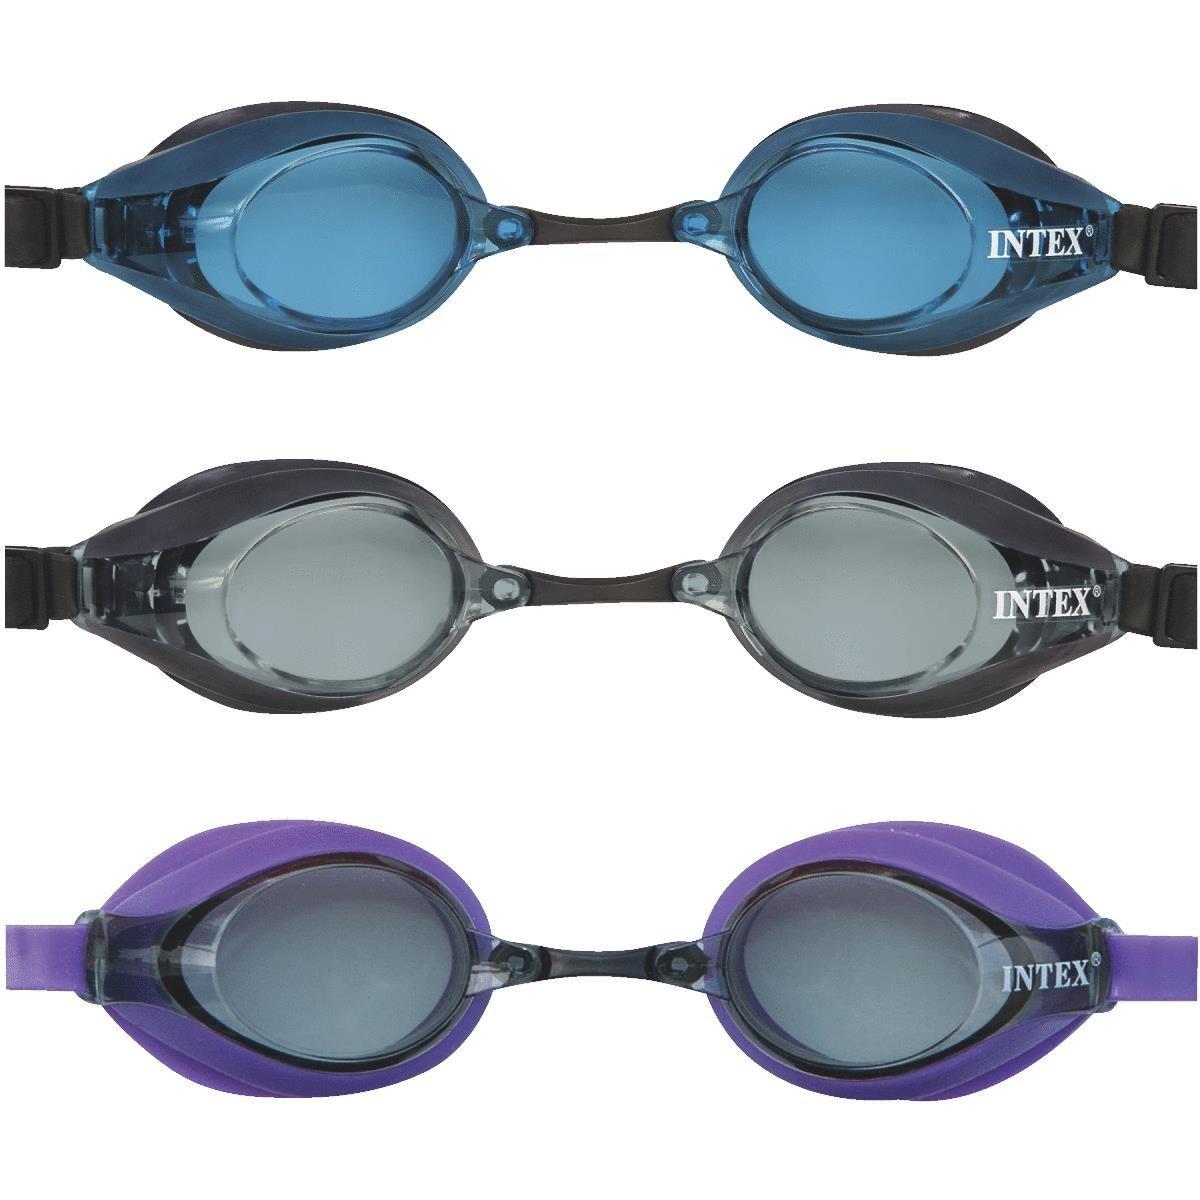 Goggles, Masks, Snorkels, & Fins